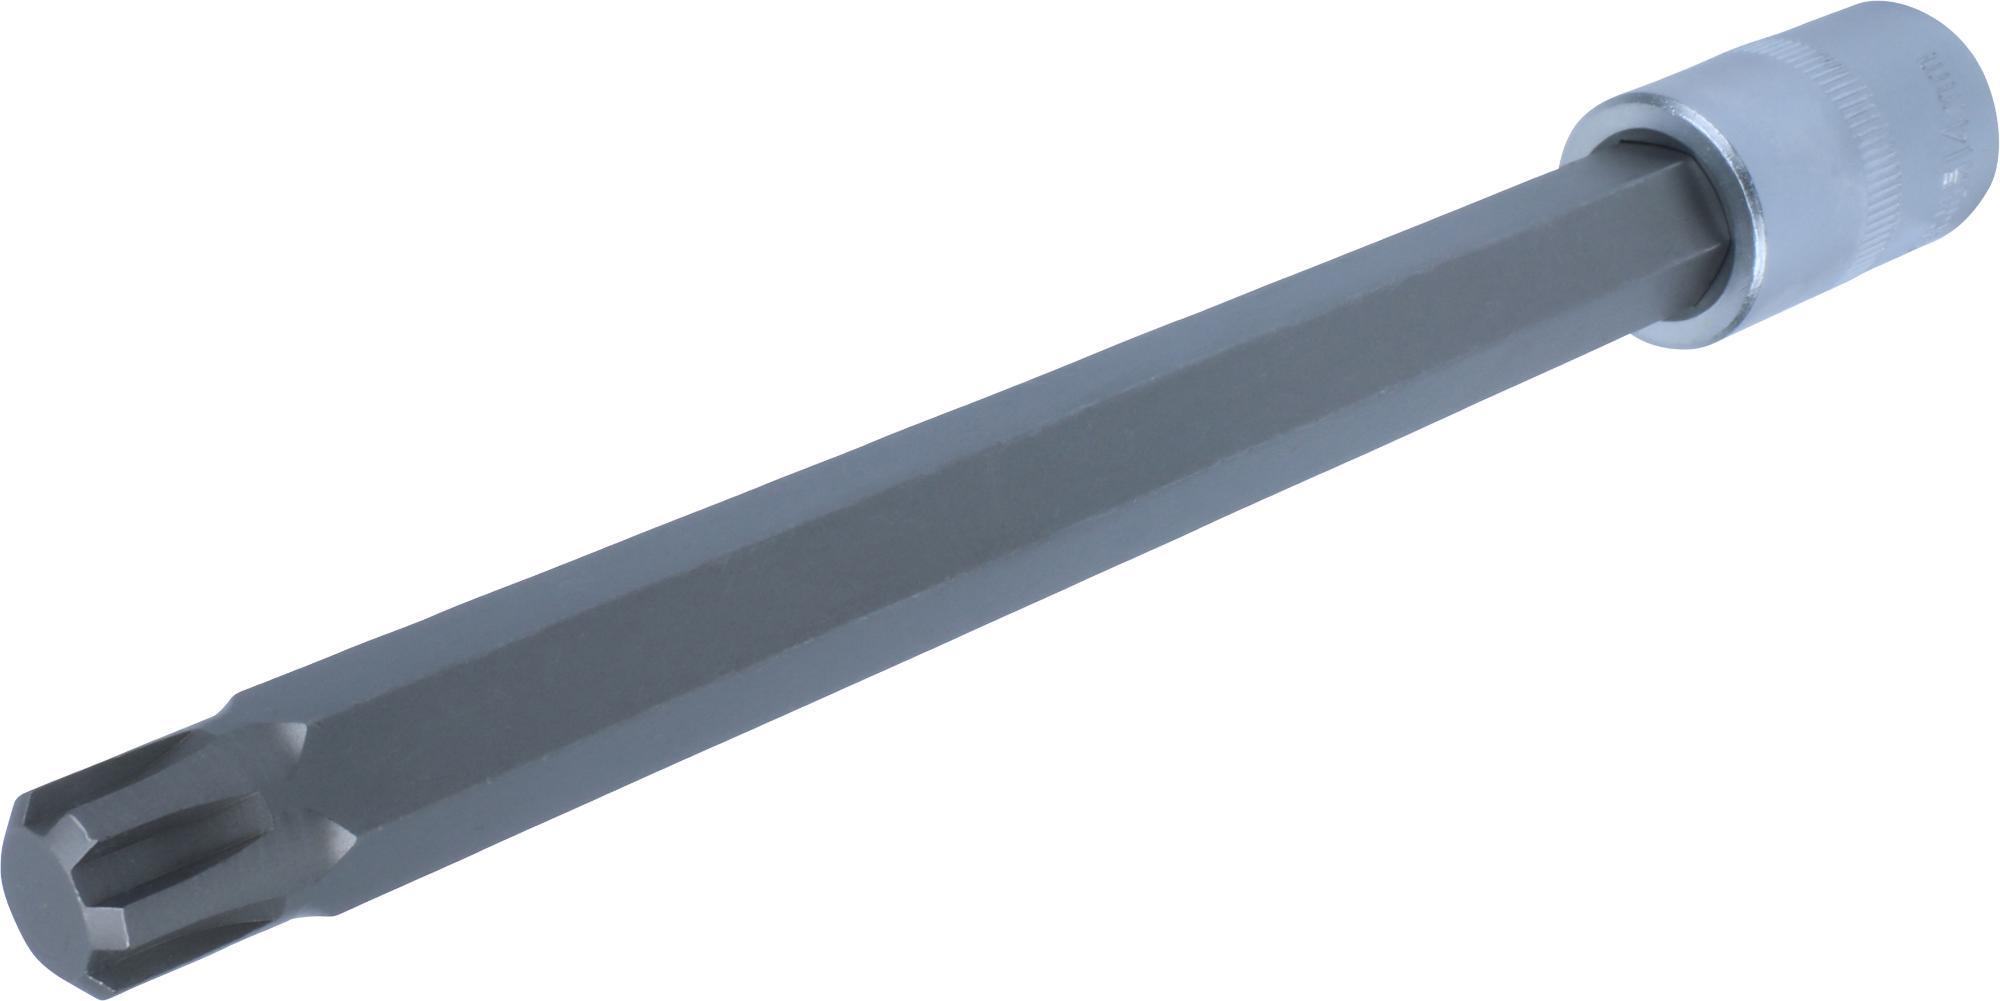 "Nástavec, 1/2"", Keilnut M14x200 mm"